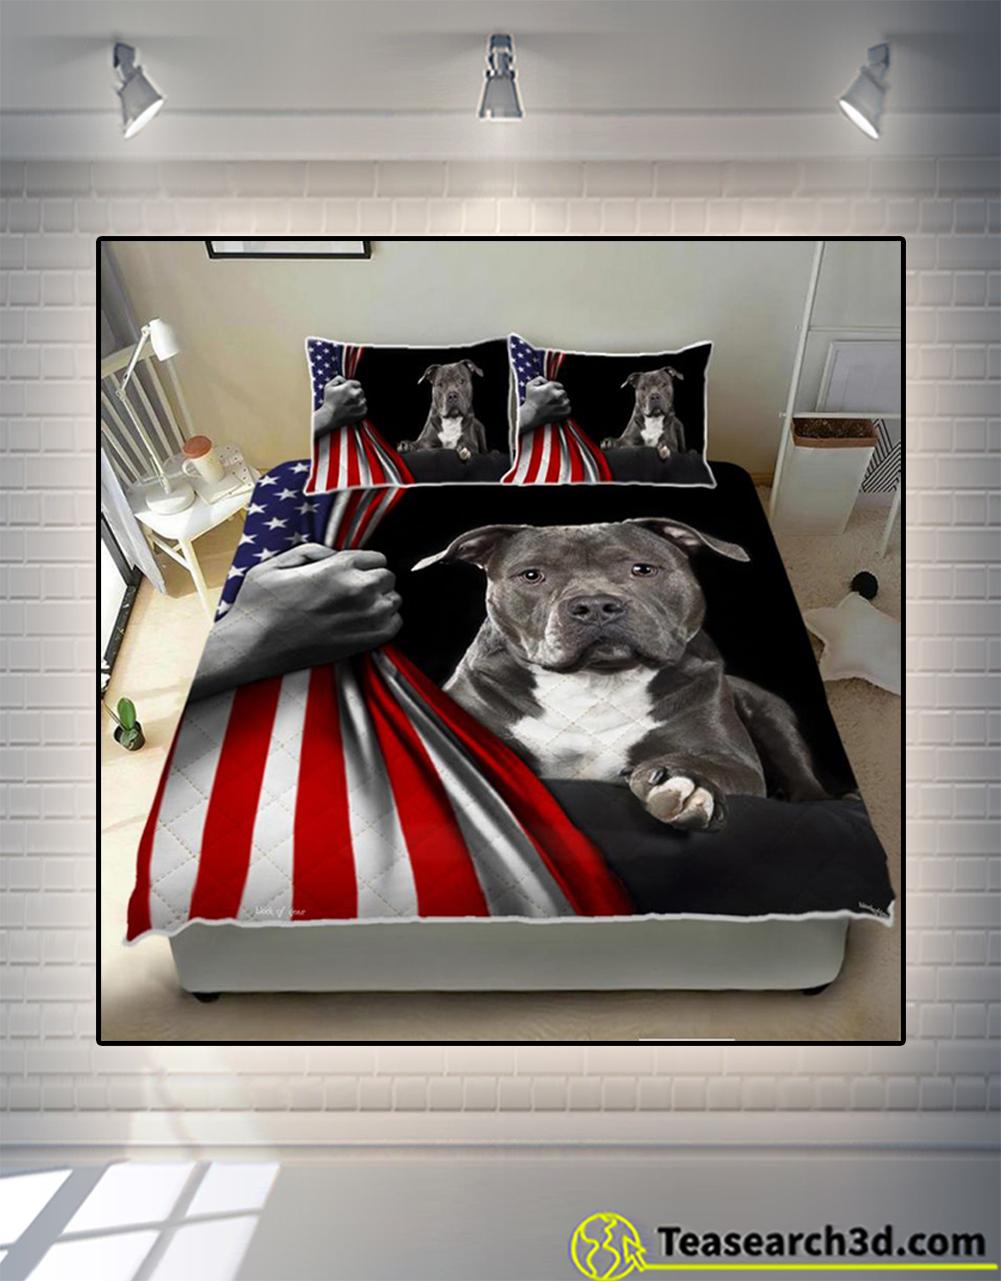 American Staffordshire Terrier bedding set